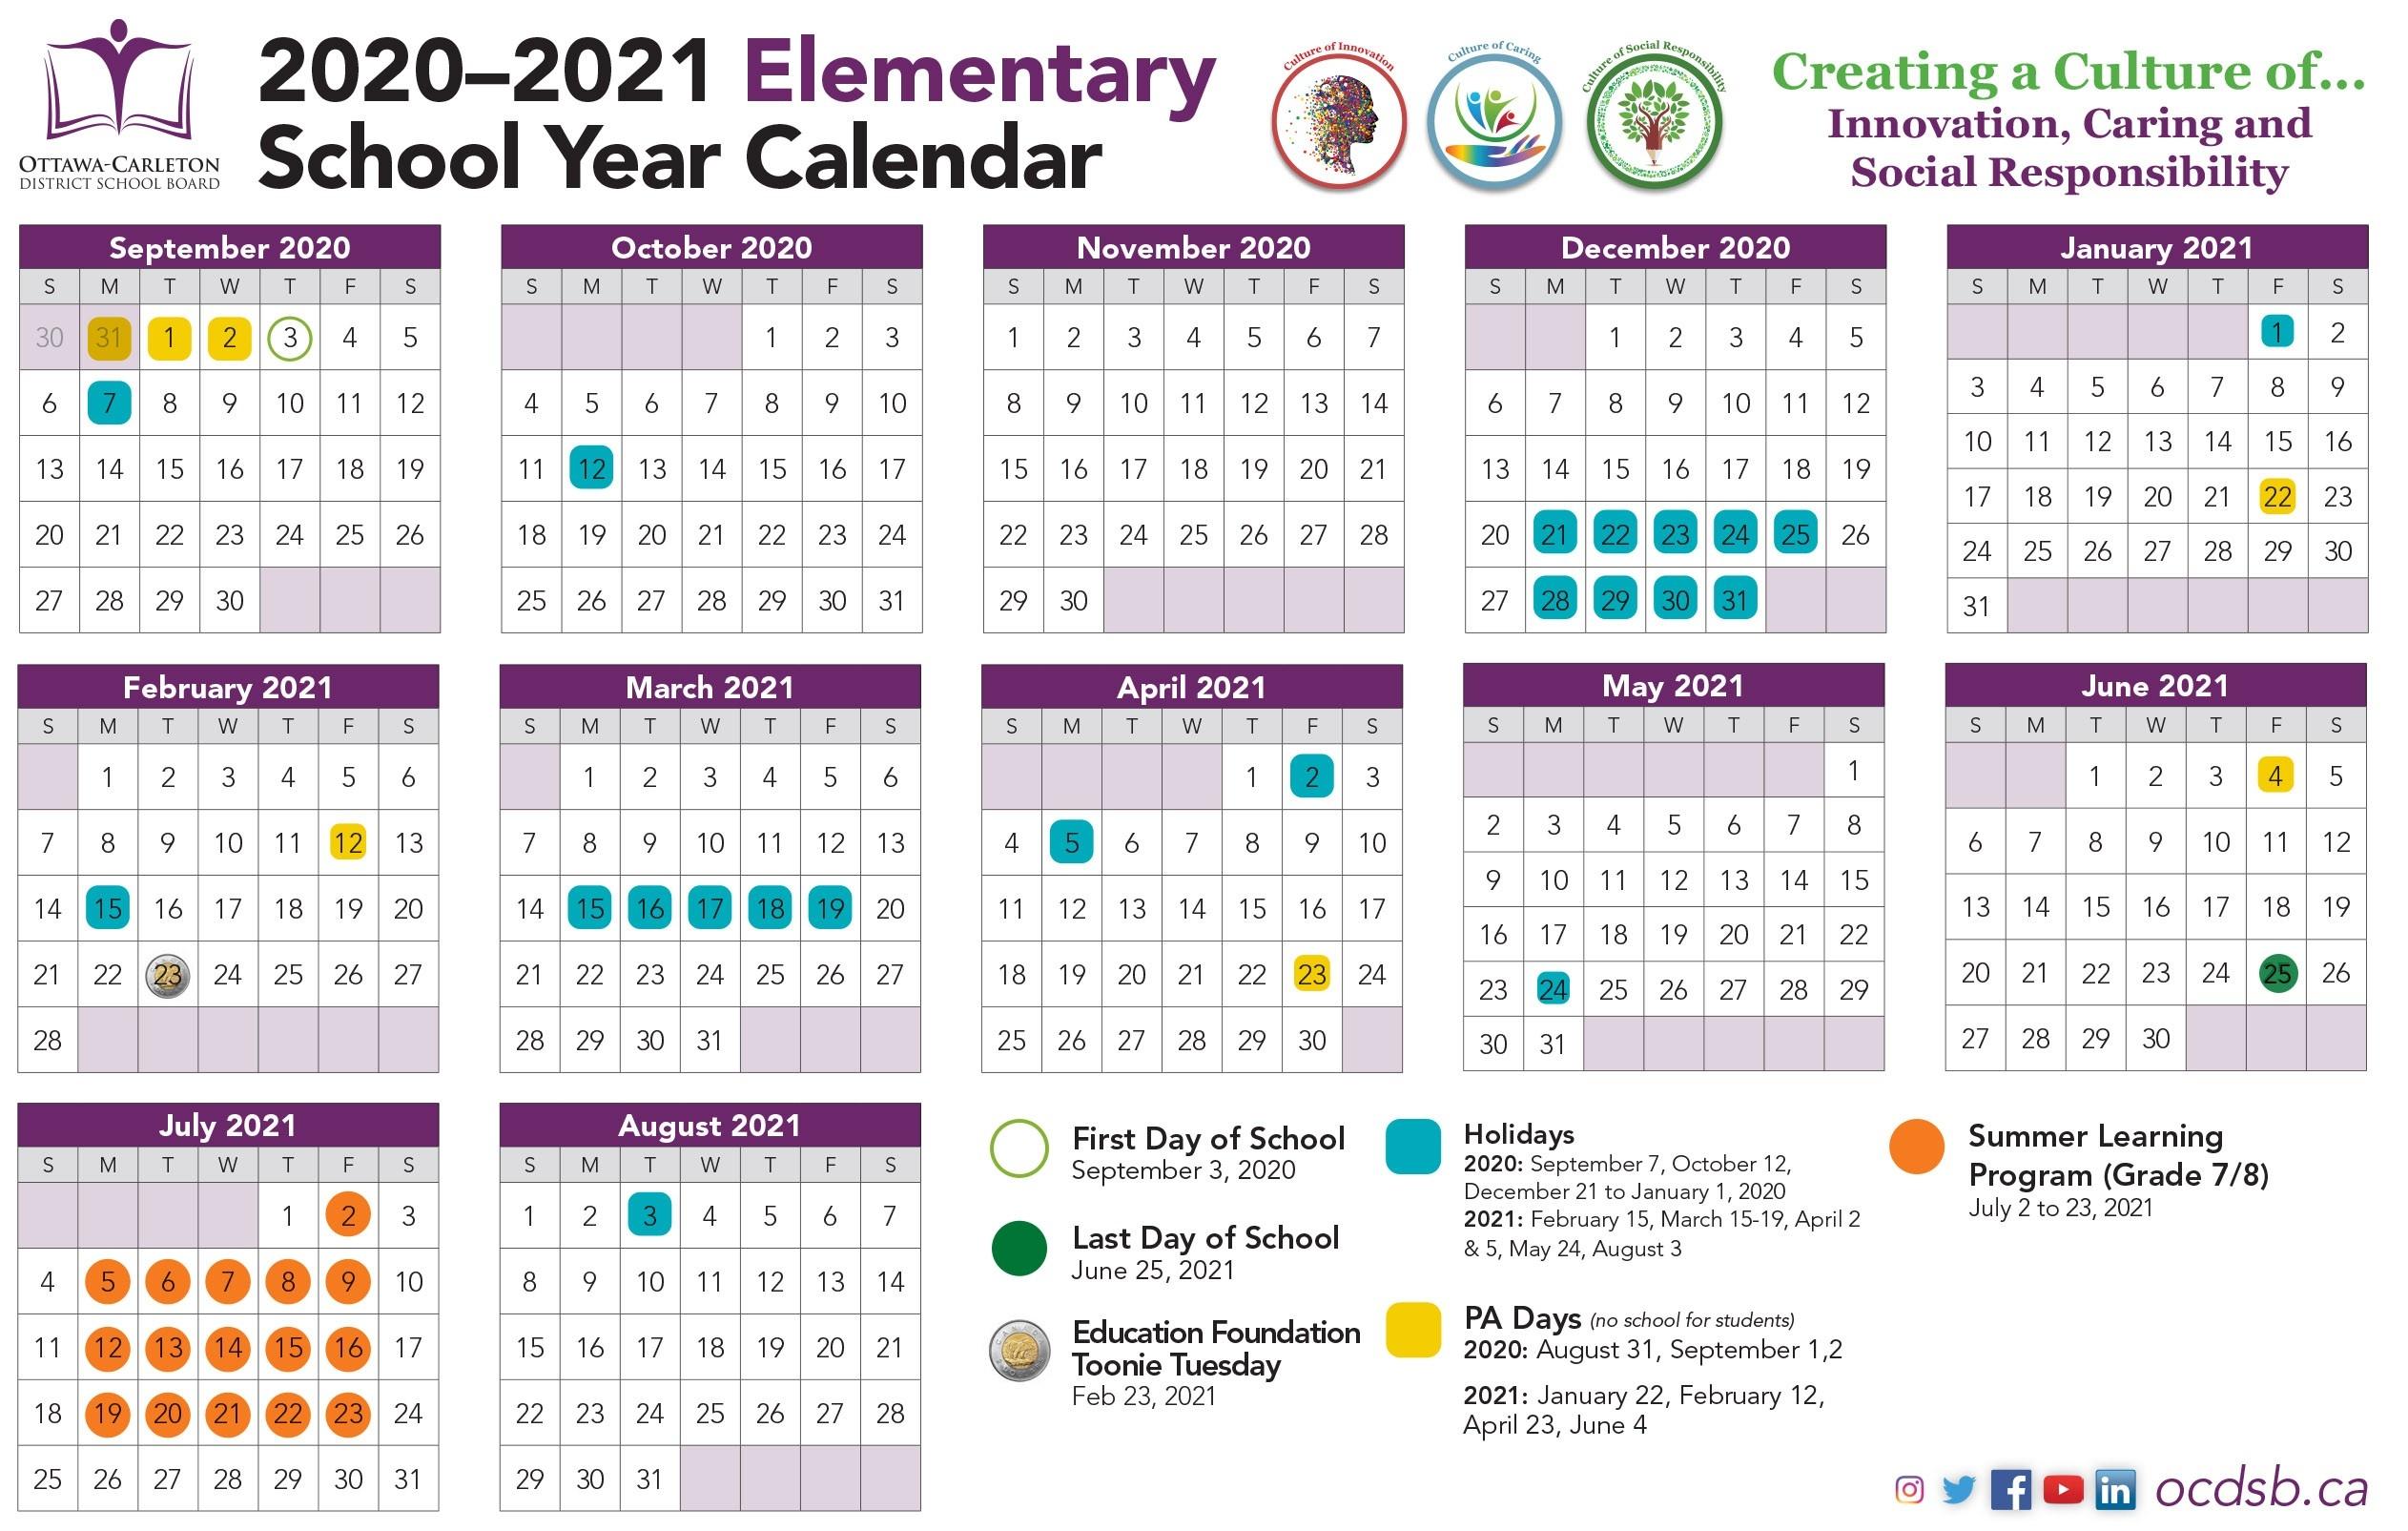 2020-2021 School Year Calendar Approved By The Ministry - Ottawa-Carleton District School Board-2021 4 Shift Calendar